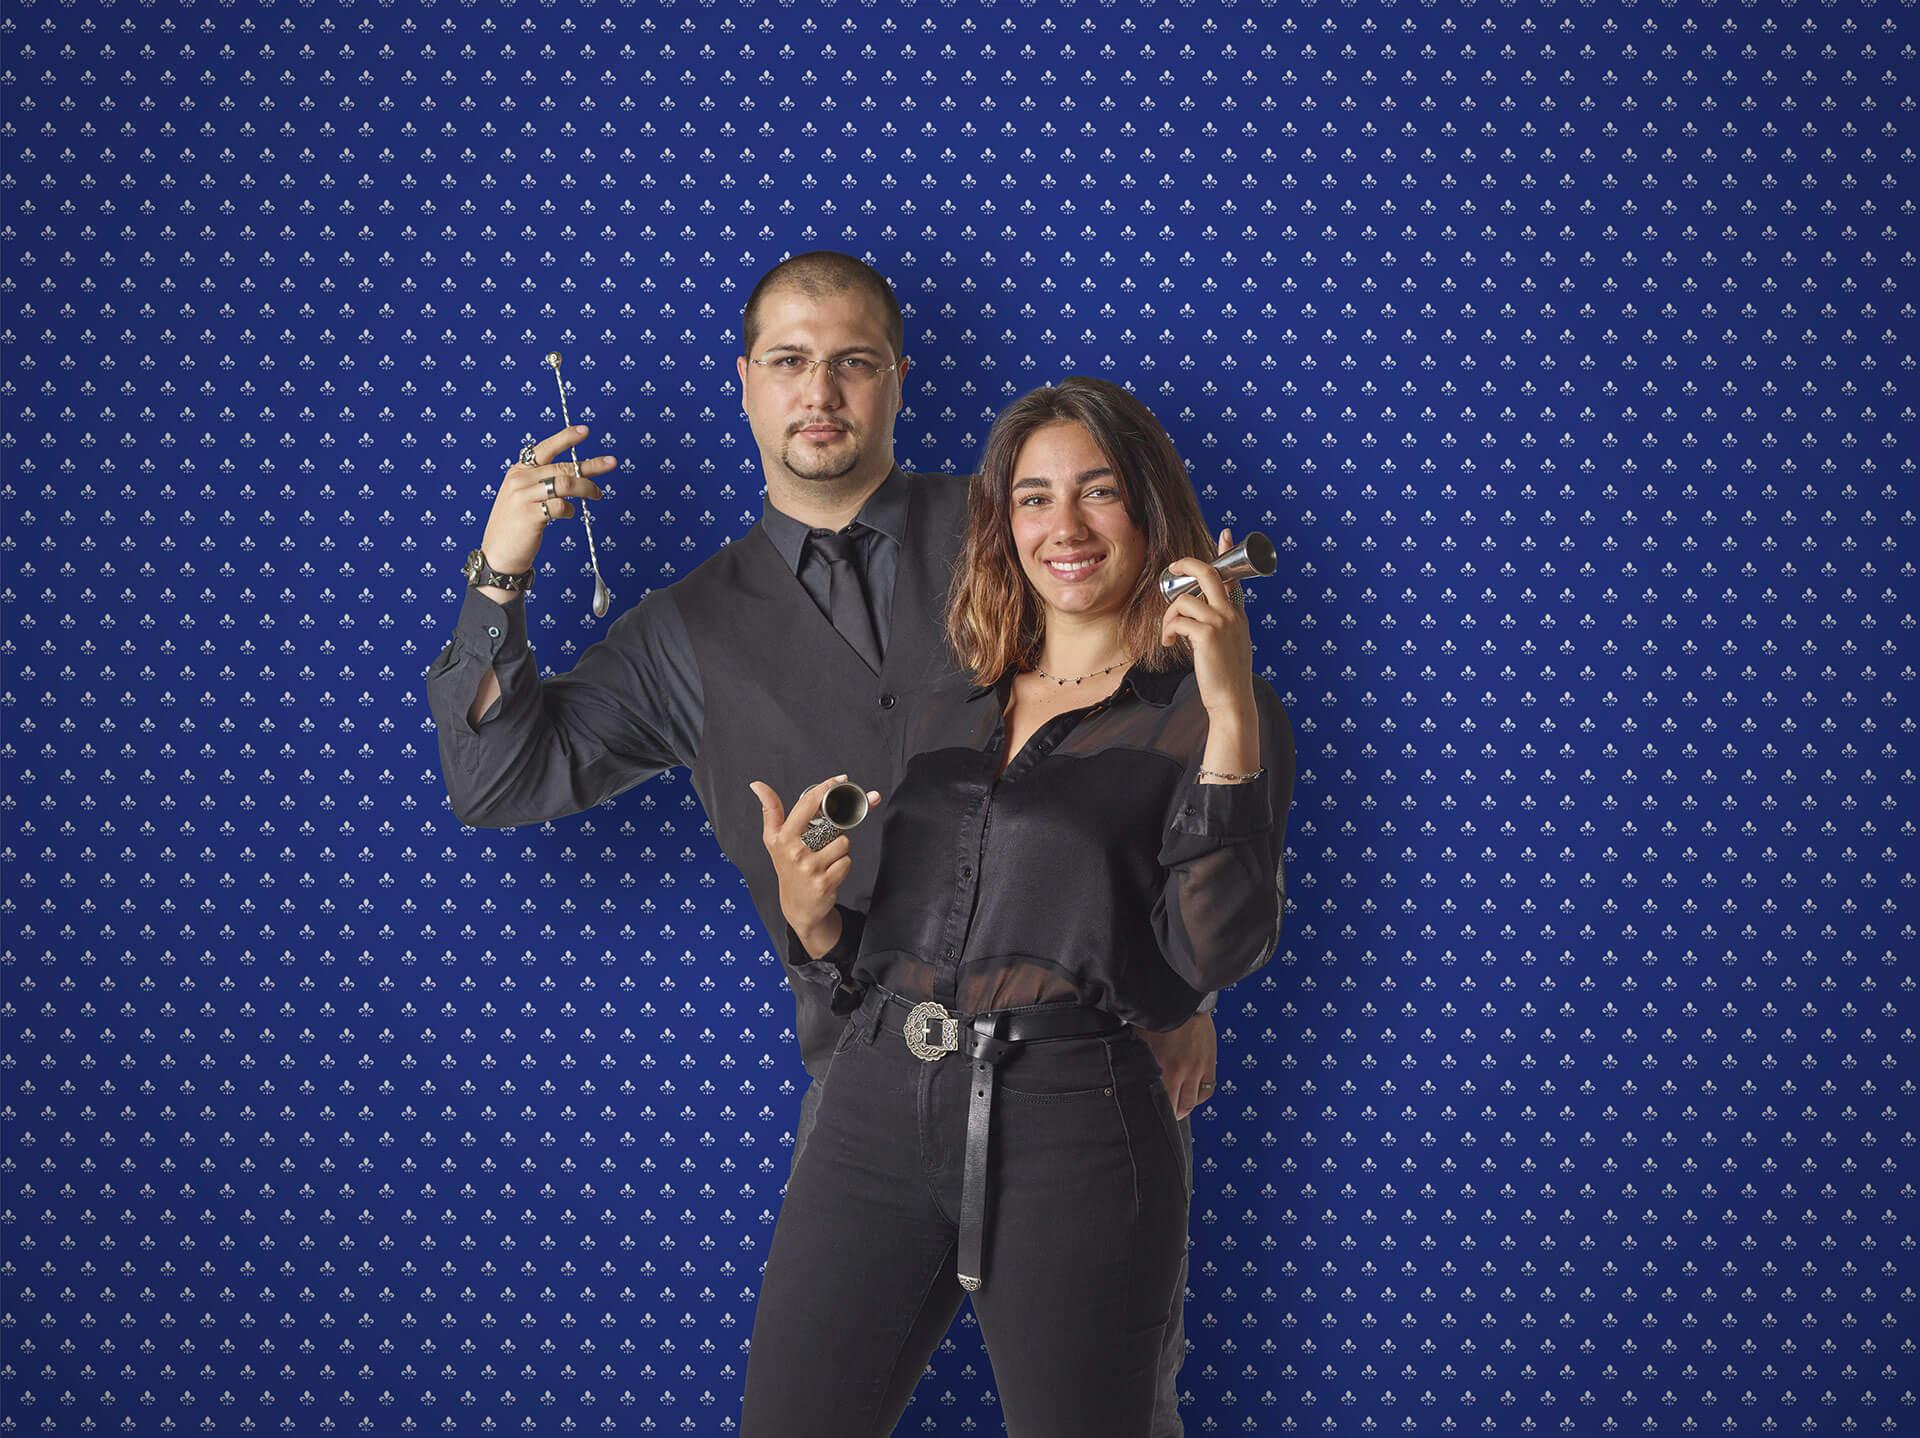 Nico Priori e Arianna Valeriani - Angel Roofbar & Dining – Hotel Calimala